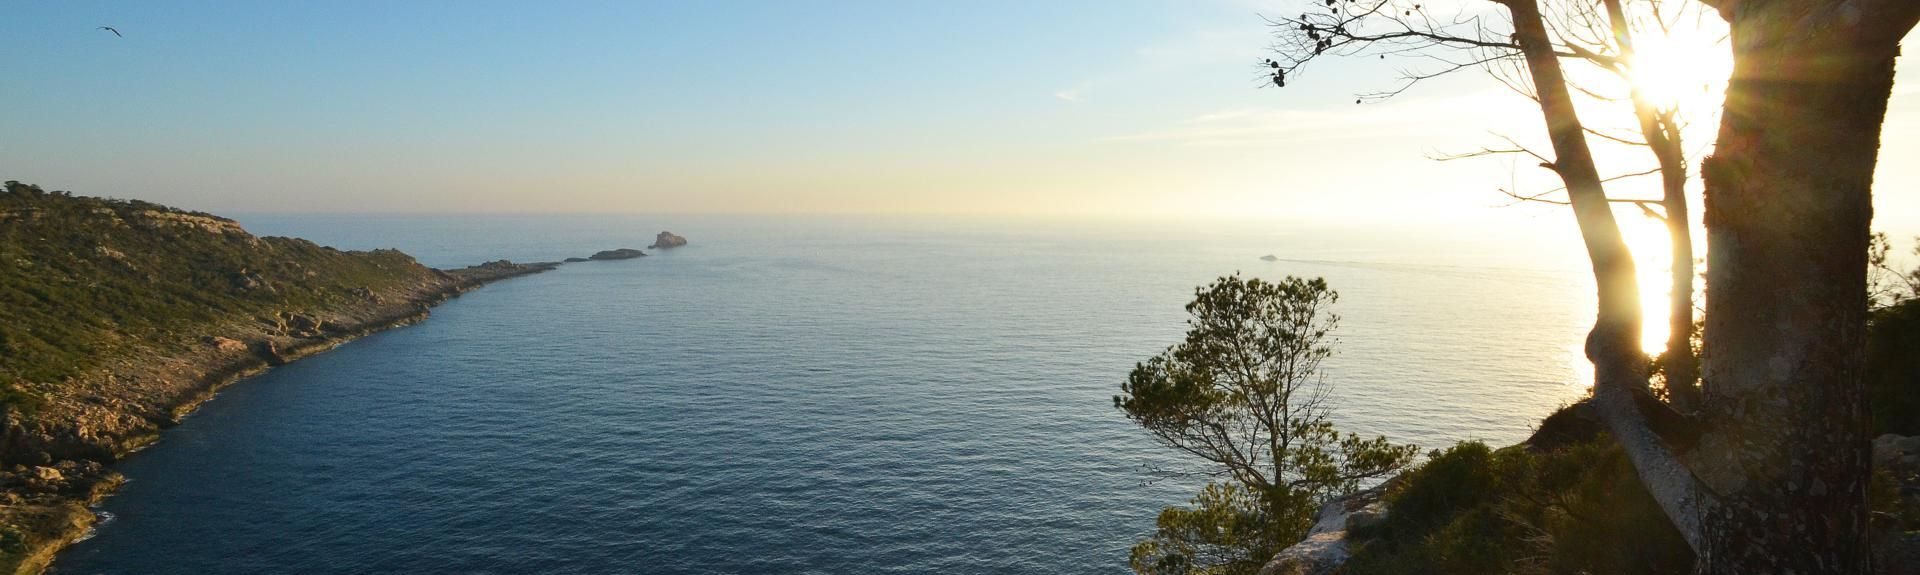 Palma Nova Beach, Calvia, Balearic Islands, Spain